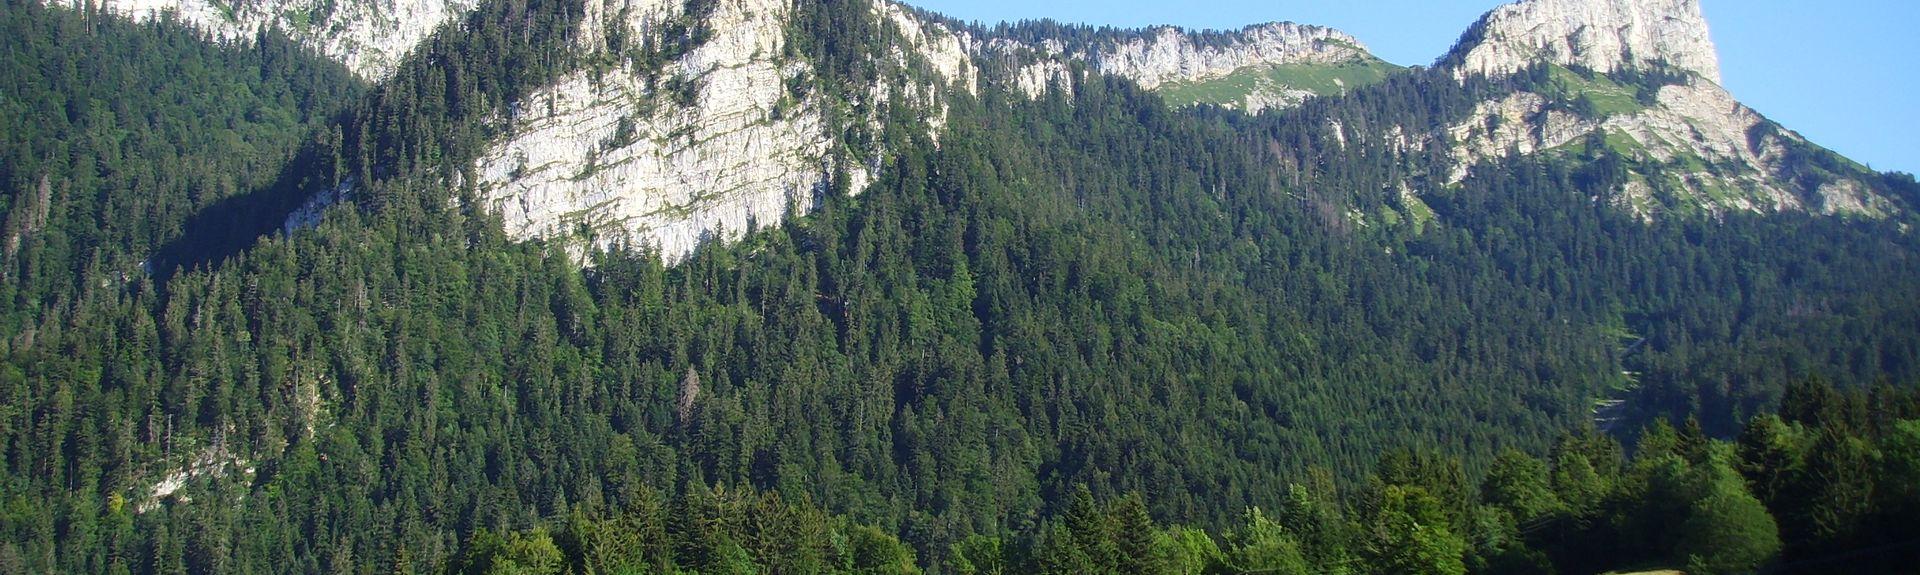 Saint-Ismier, Auvergne-Rhône-Alpes, França